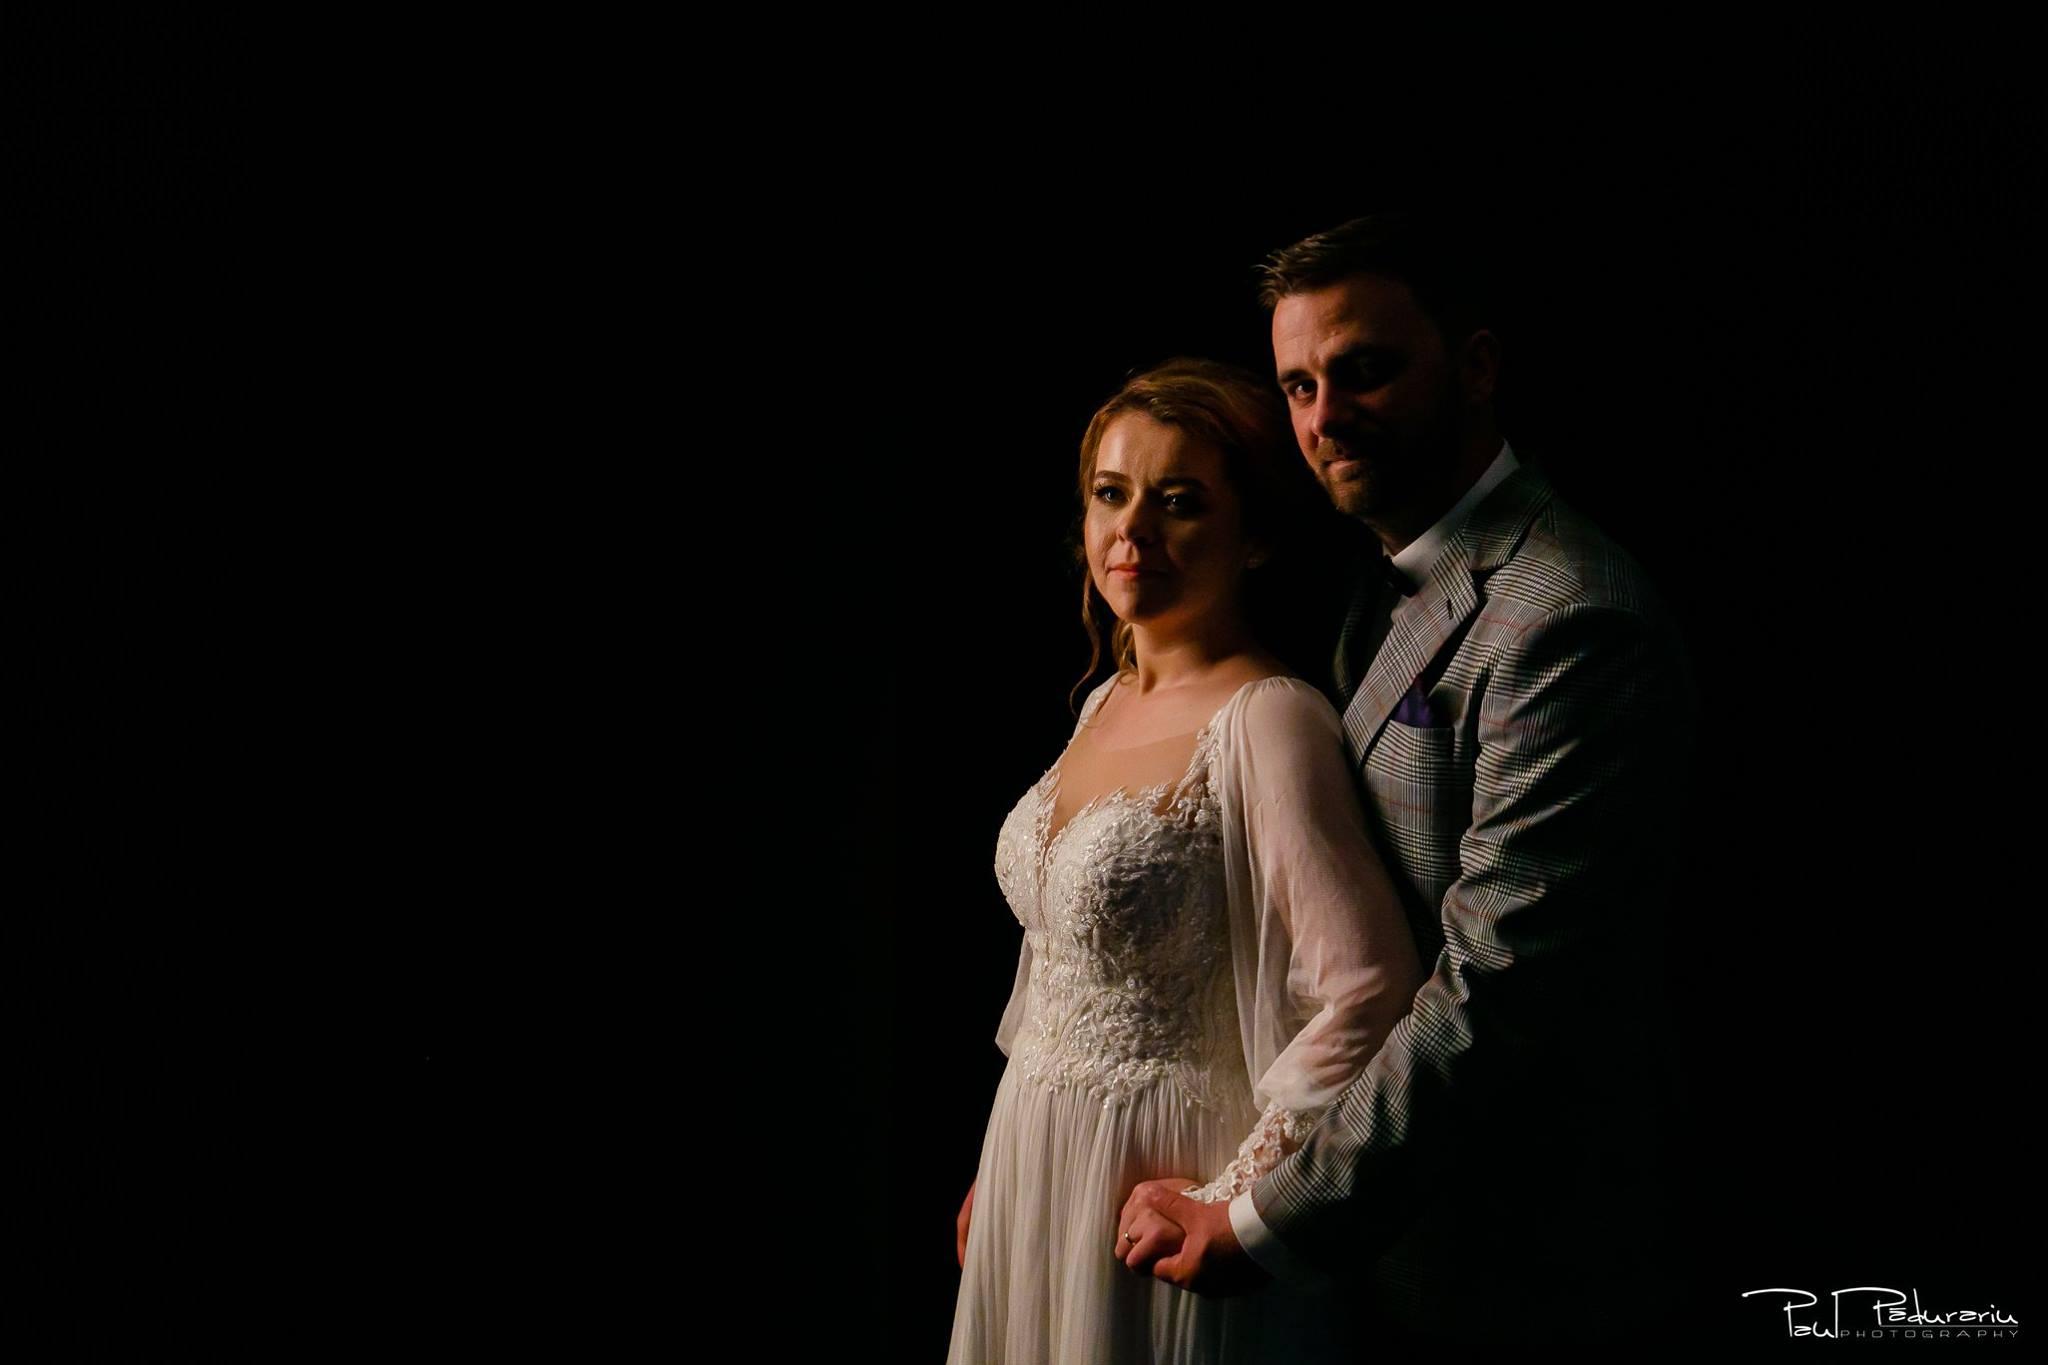 Adriana si Ionut sedinta foto nunta iasi fotograf profesionist paul padurariu 2019 2